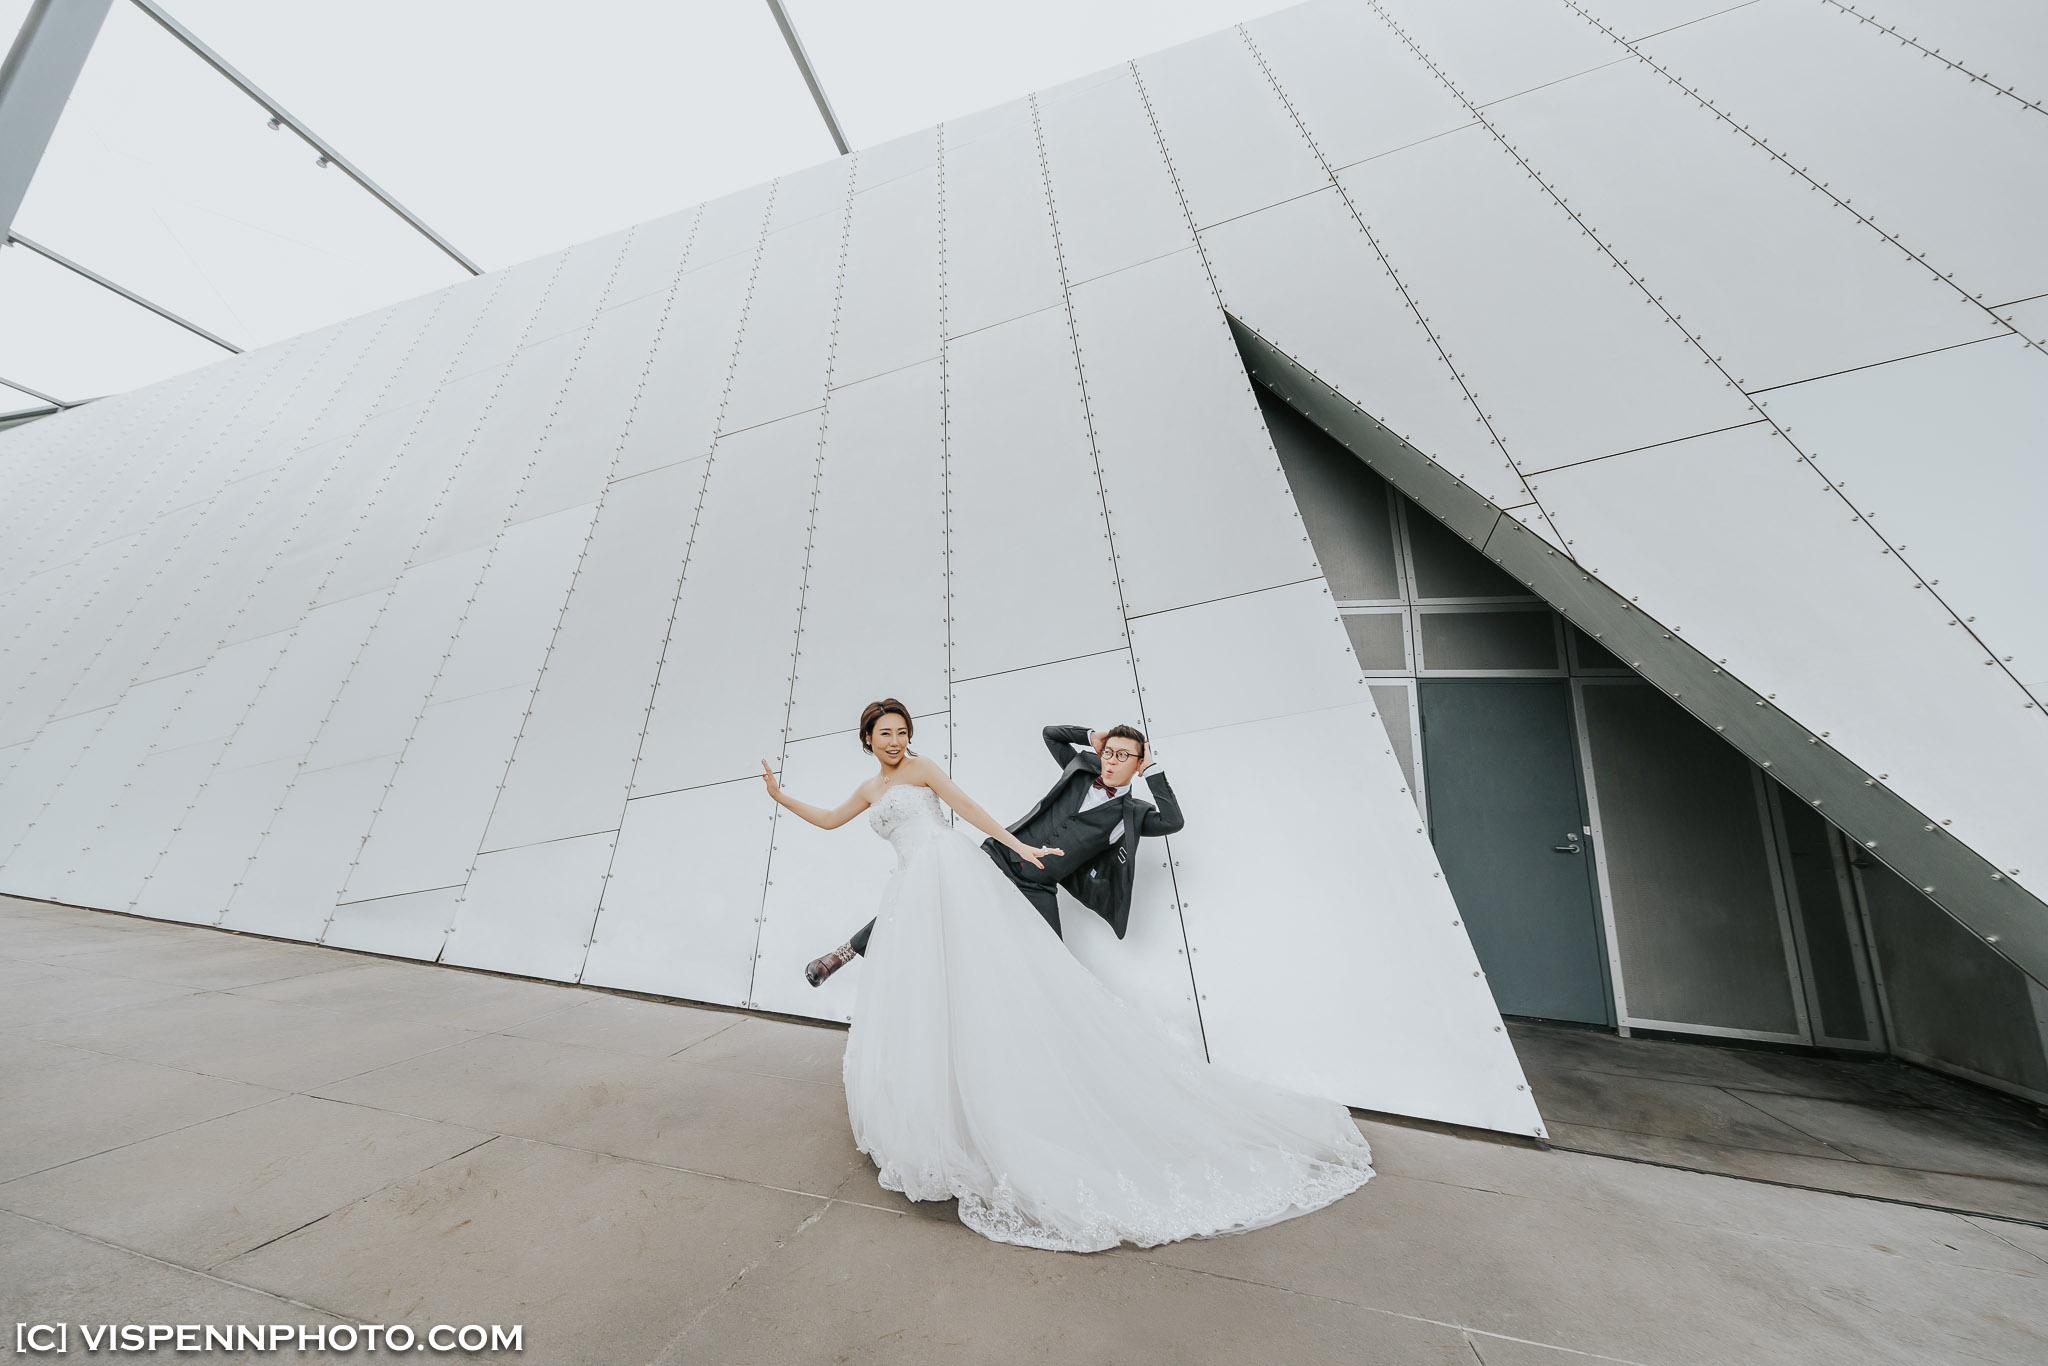 PRE WEDDING Photography Melbourne VISPENN 墨尔本 婚纱照 结婚照 婚纱摄影 VISPENN ElaneLiu 1182